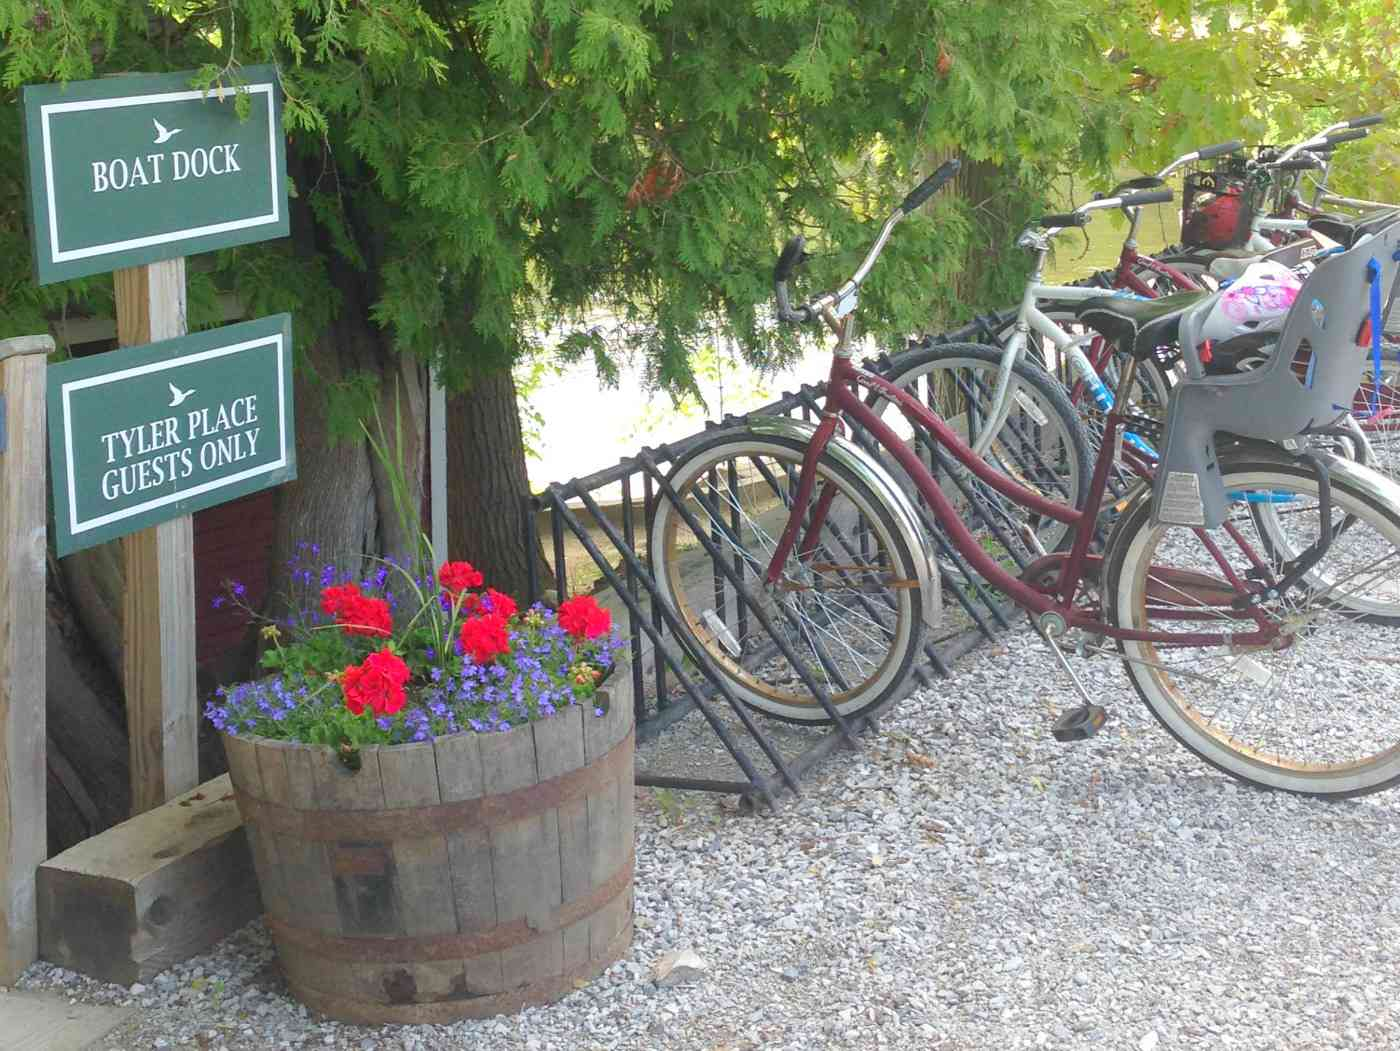 20 Best Bike-Friendly Resorts for Family Getaways